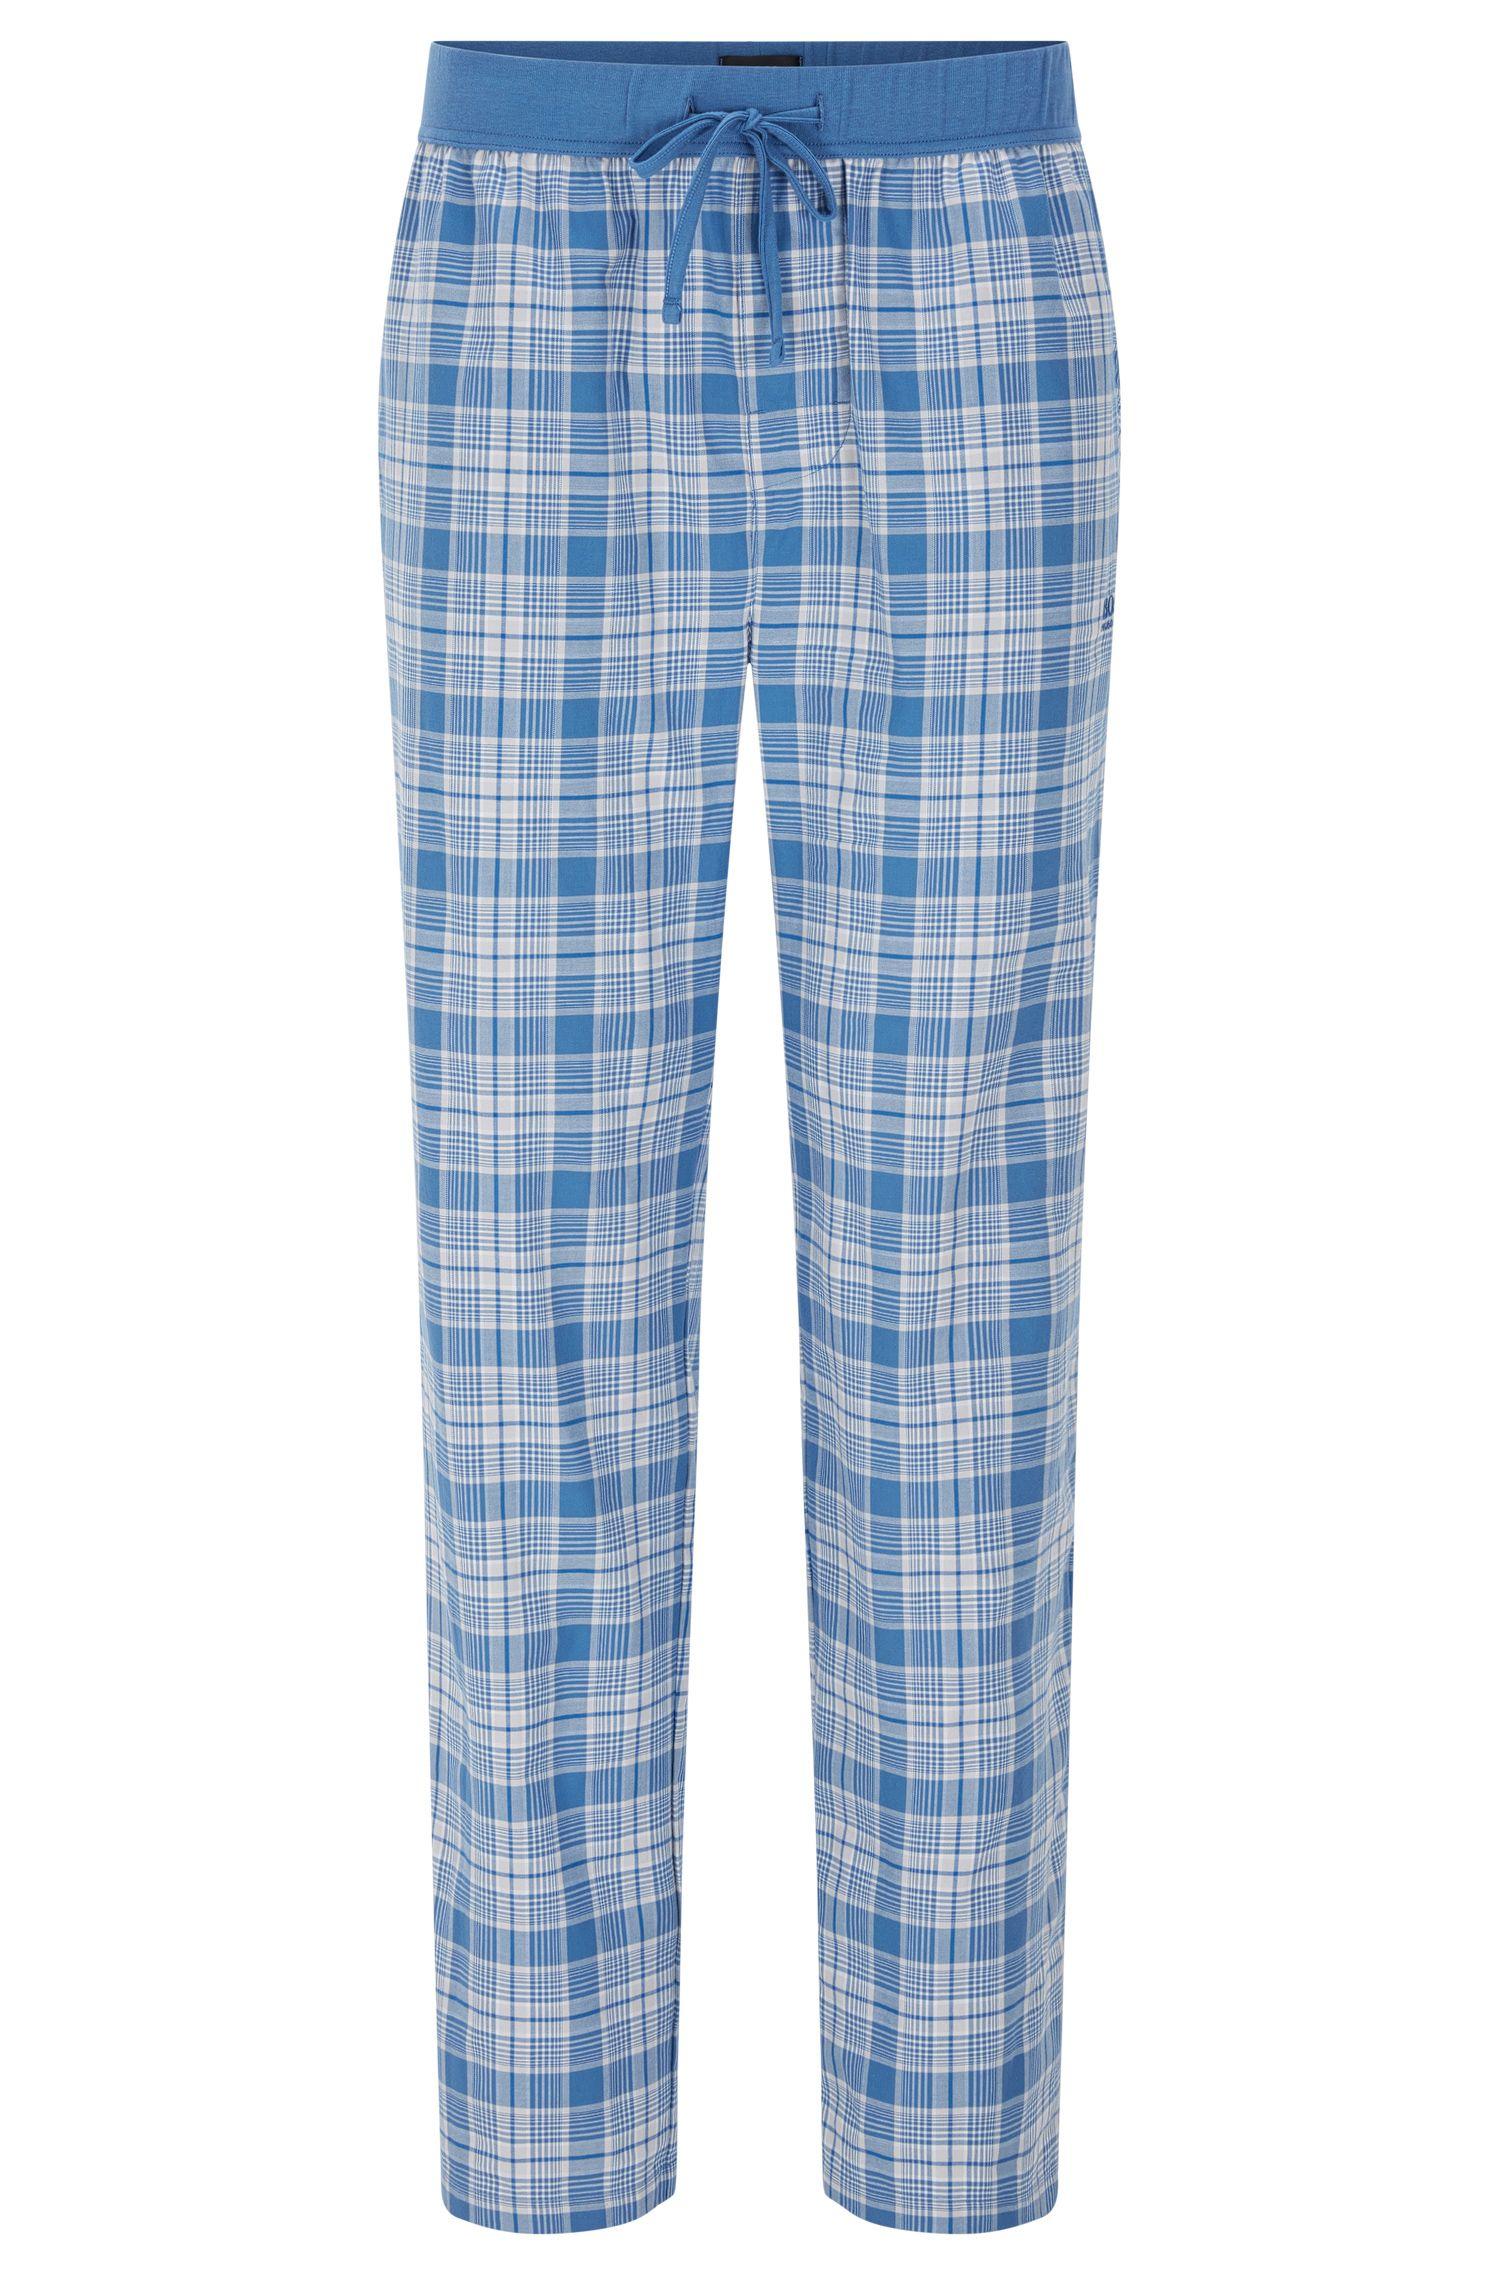 Karierte Pyjama-Hose aus Baumwolle mit Tunnelzugbund: 'Long Pant CW'